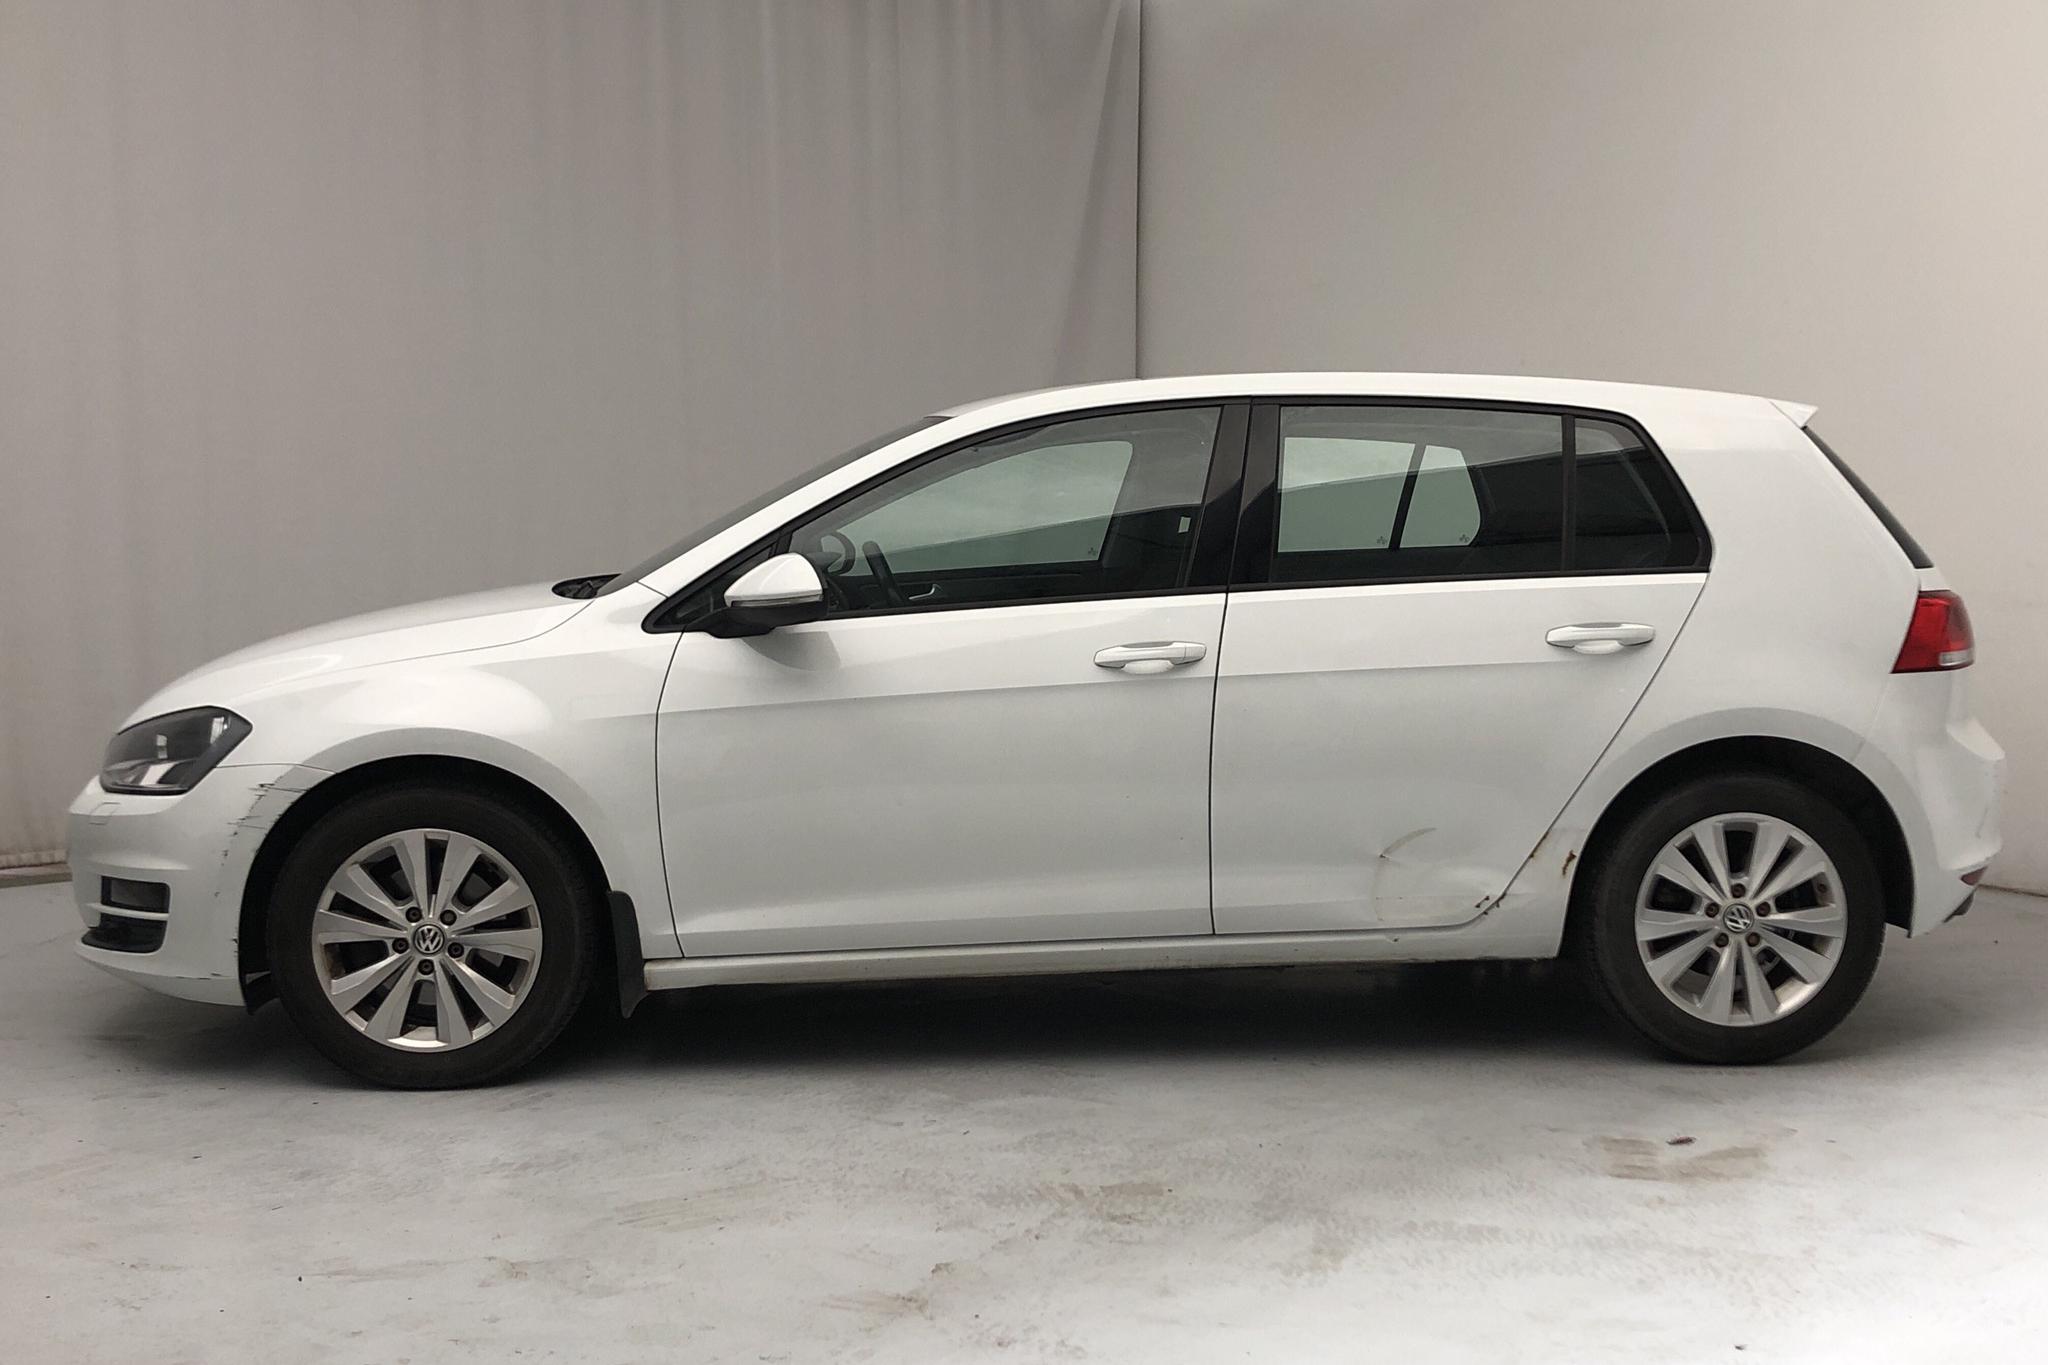 VW Golf VII 1.4 TSI Multifuel 5dr (122hk) - 106 540 km - Manual - white - 2014